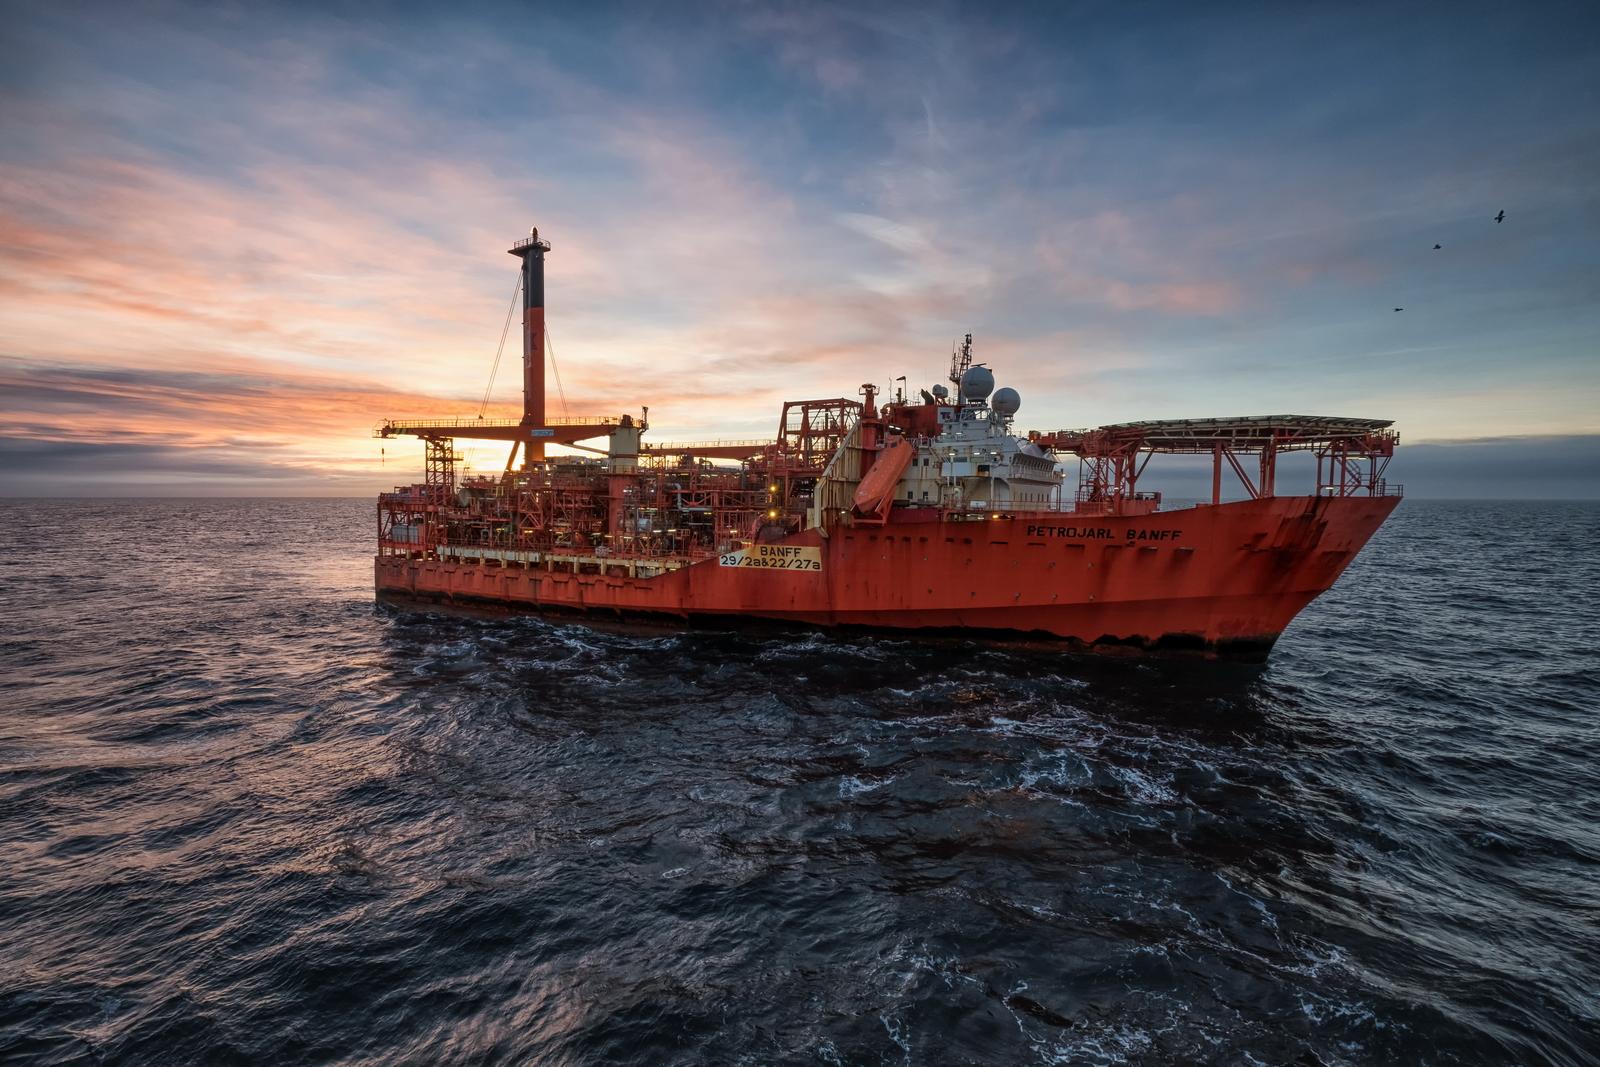 Petrojarl Banff – FPSO Petrojarl Banff under the Sunrise. This unit is a part of Banff Oilfield located on the North Sea. Fuji XPro-2, XF 10-20, 1/125s, f8, ISO 200